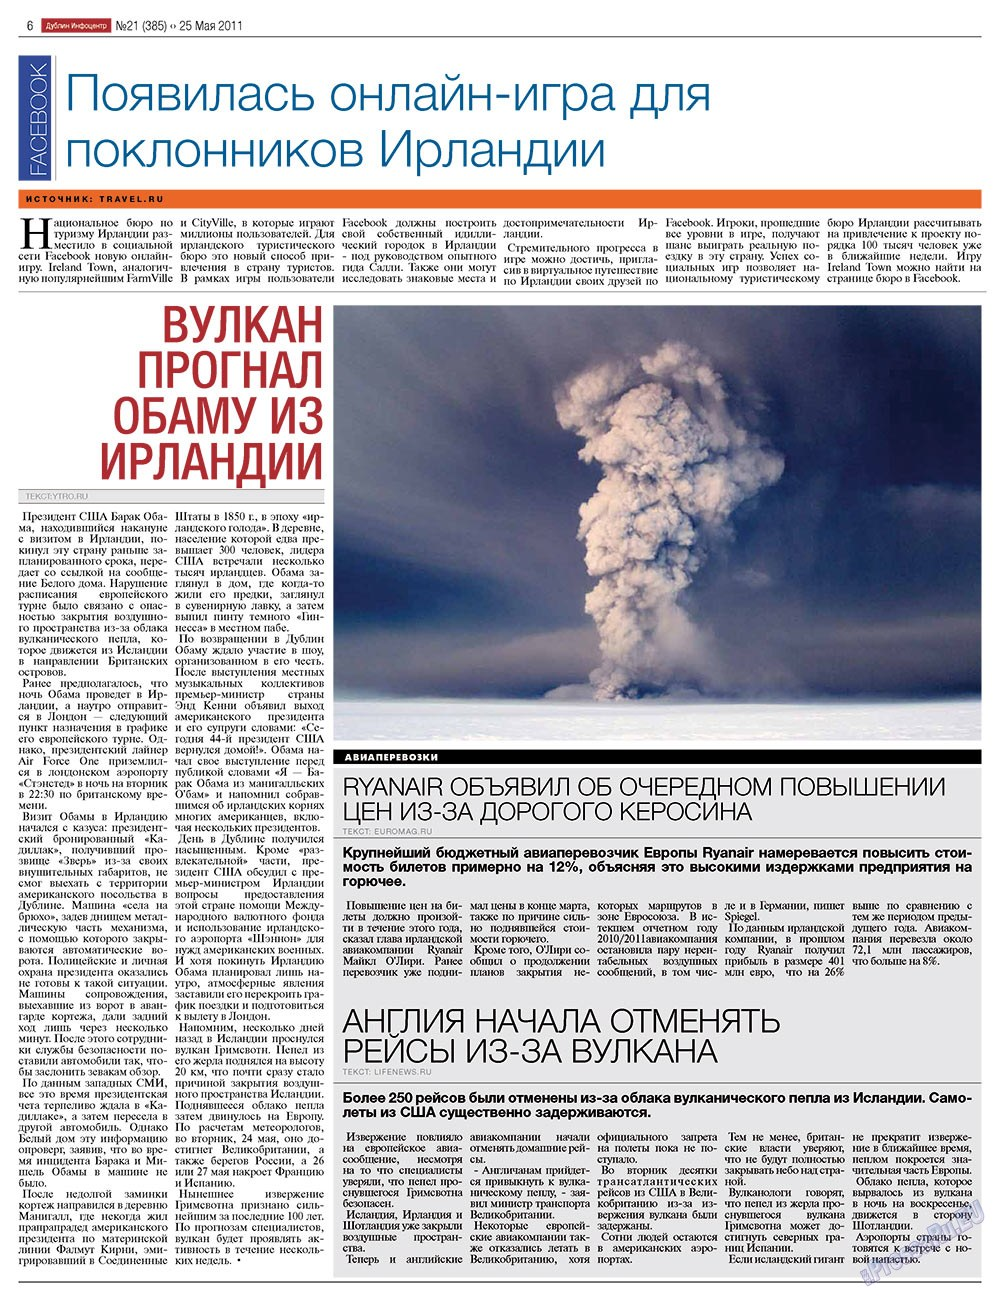 Дублин инфоцентр (газета). 2011 год, номер 21, стр. 6